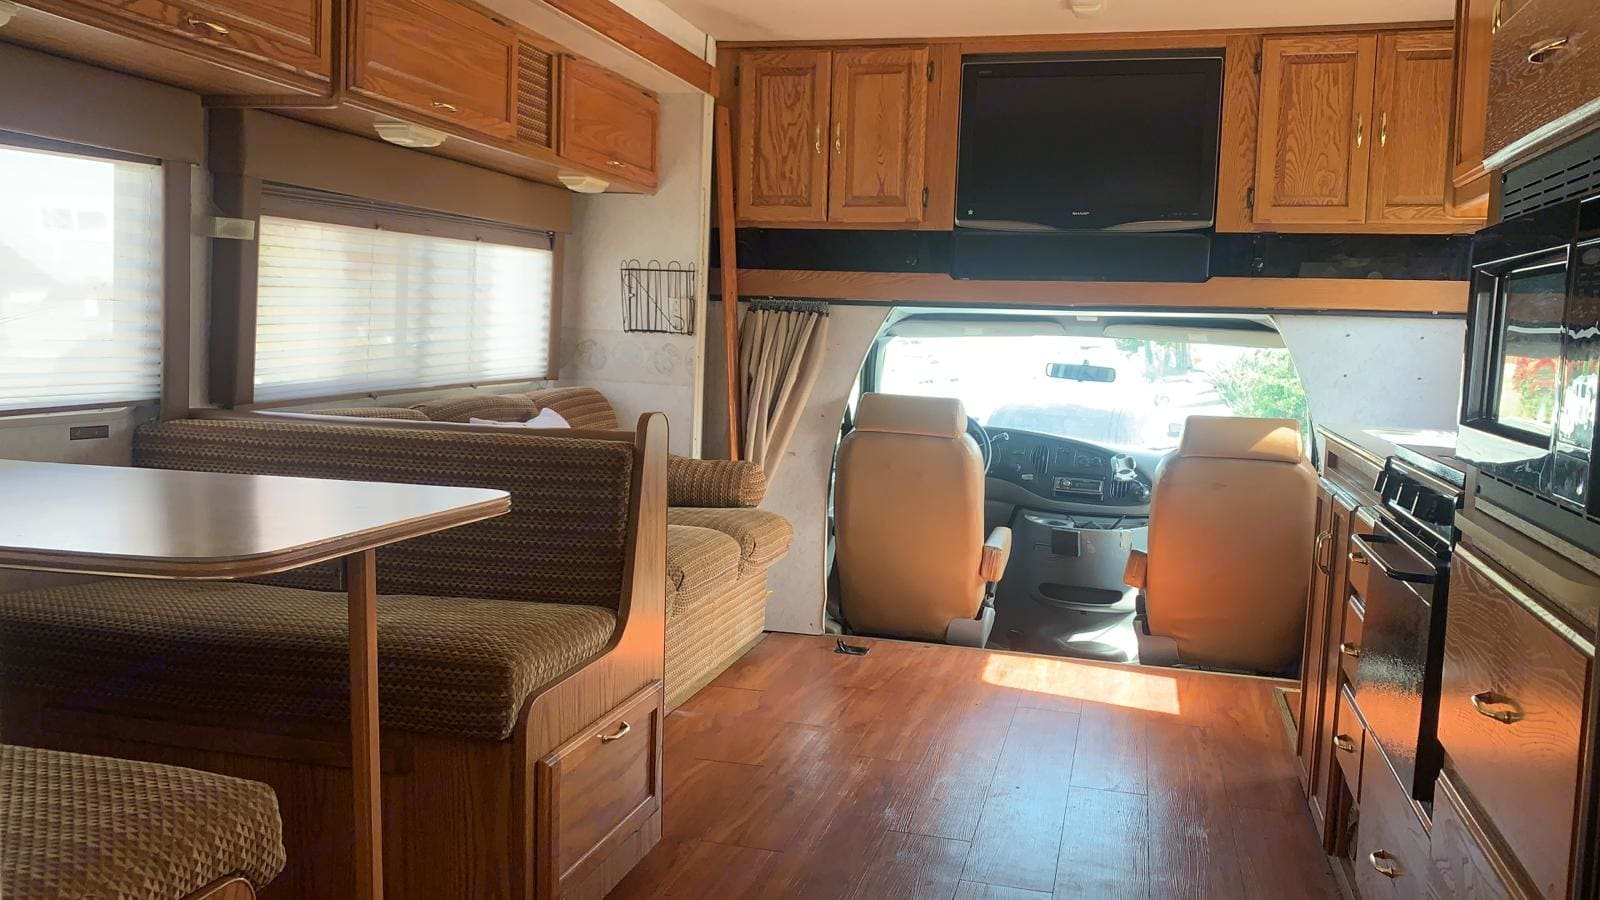 Dinette seats 4, sofa seats 3, RV has 9 total seat belts. Room for multiple car seats. Flat screen TV for road trip entertaiment.. Winnebago Minnie Winnie 1999